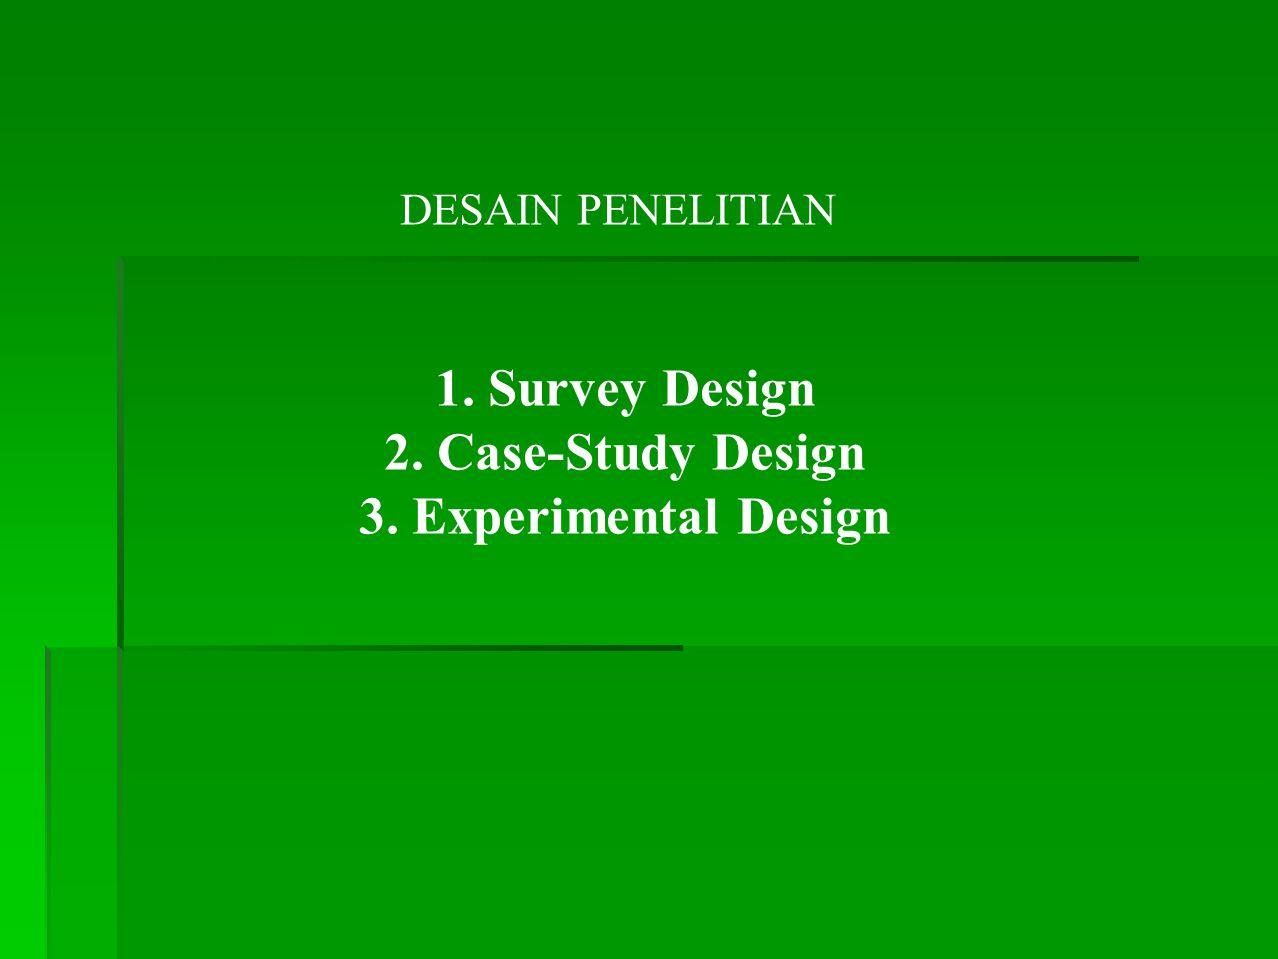 1. Survey Design 2. Case-Study Design 3. Experimental Design